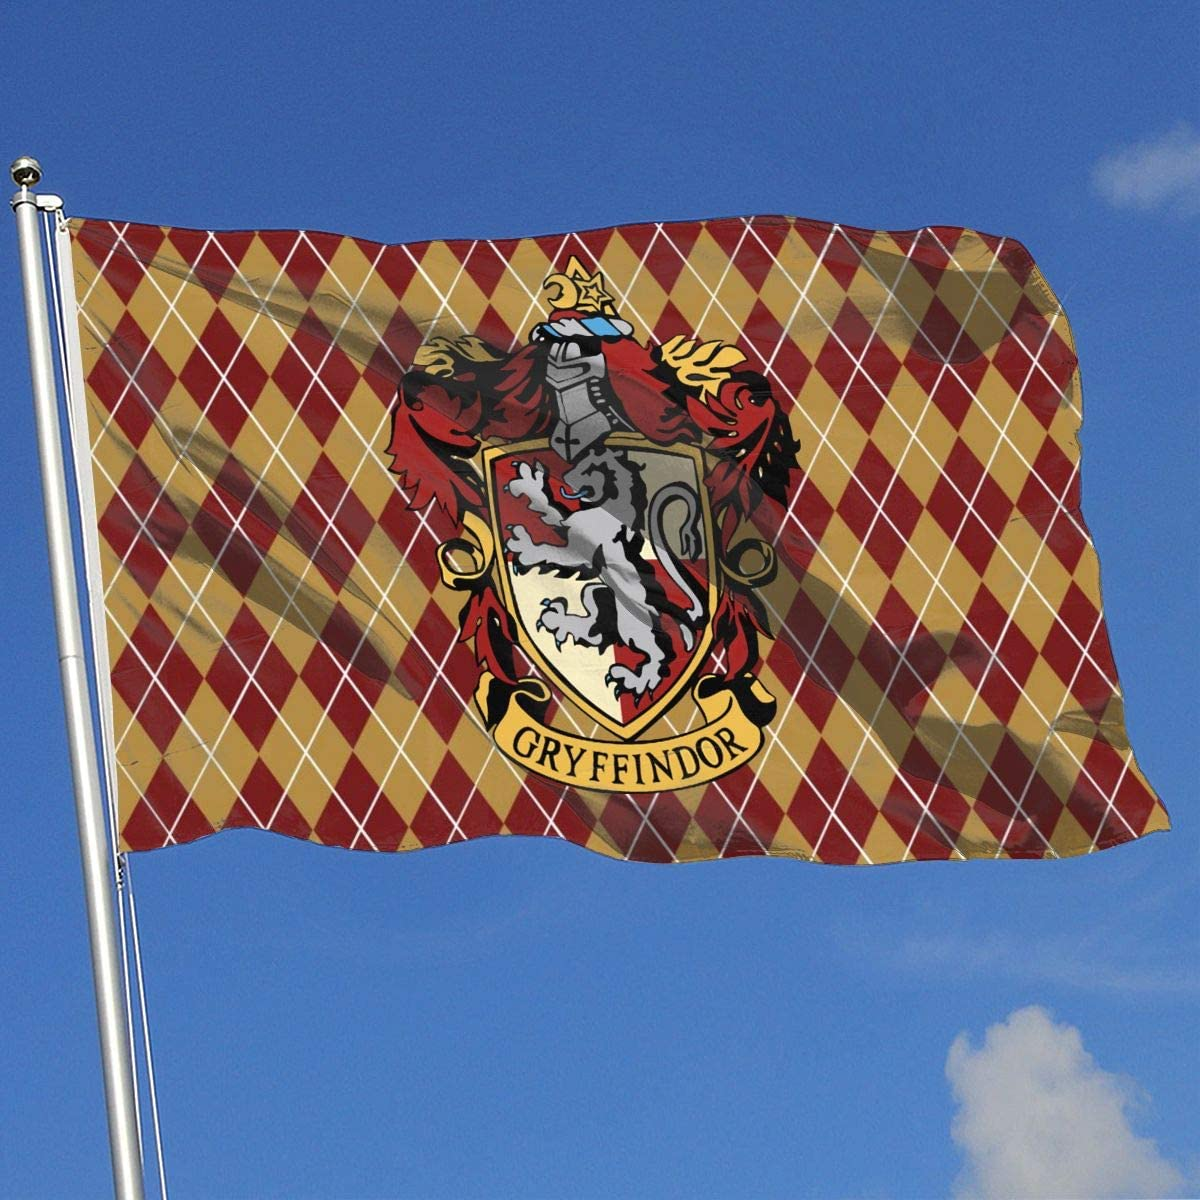 Juhucc Gryffin-dor Flag Home Flag Banner - American Flag Lndoors Outdoors Garden Flag 3x5 Feet